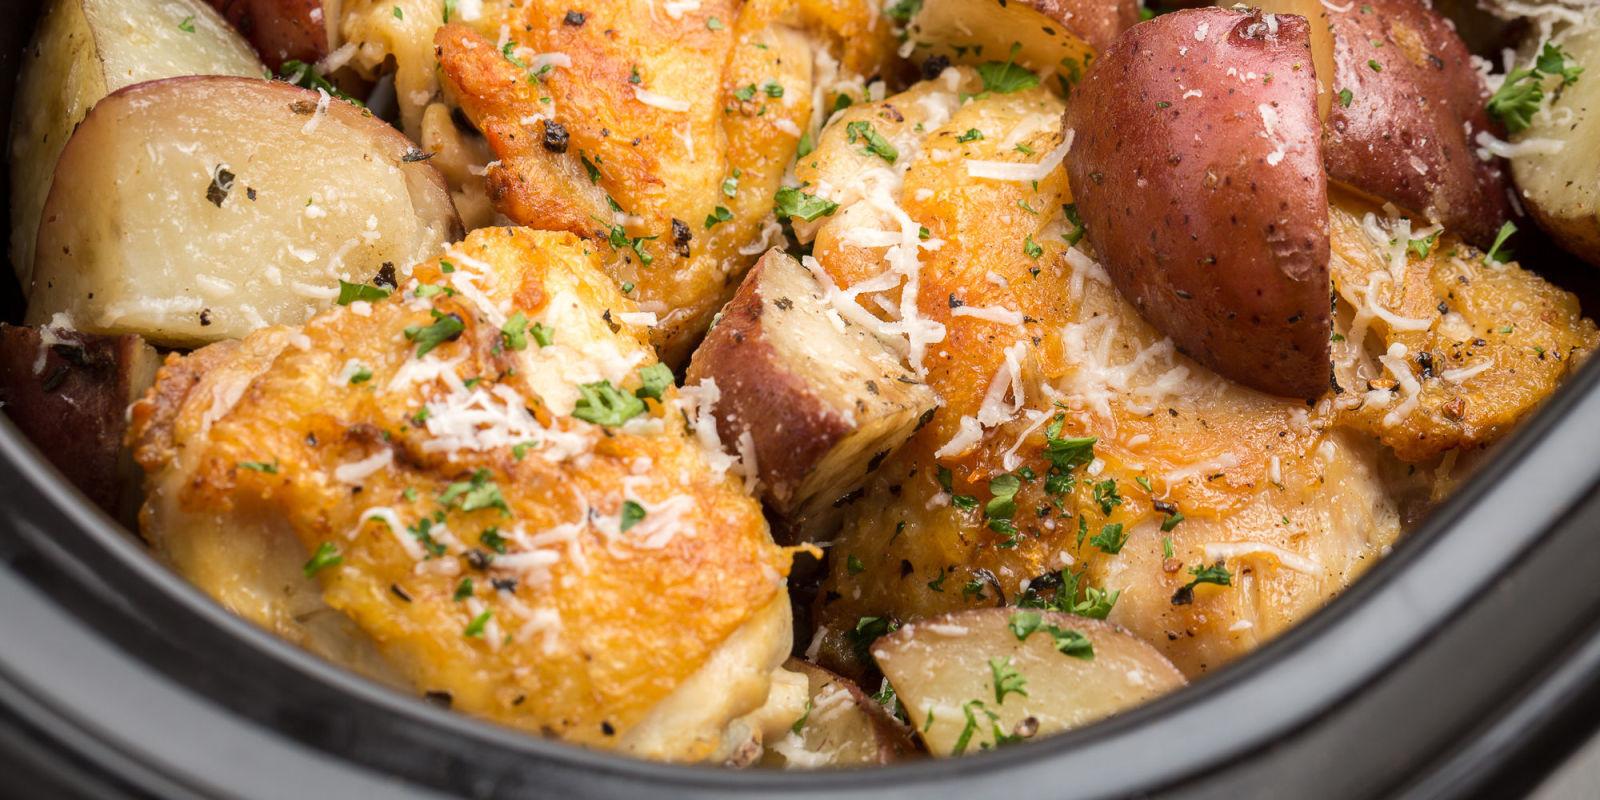 Healthy Chicken Slow Cooker Recipes  Popular Slow Cooker Chicken Pinterest Slow Cooker Chicken